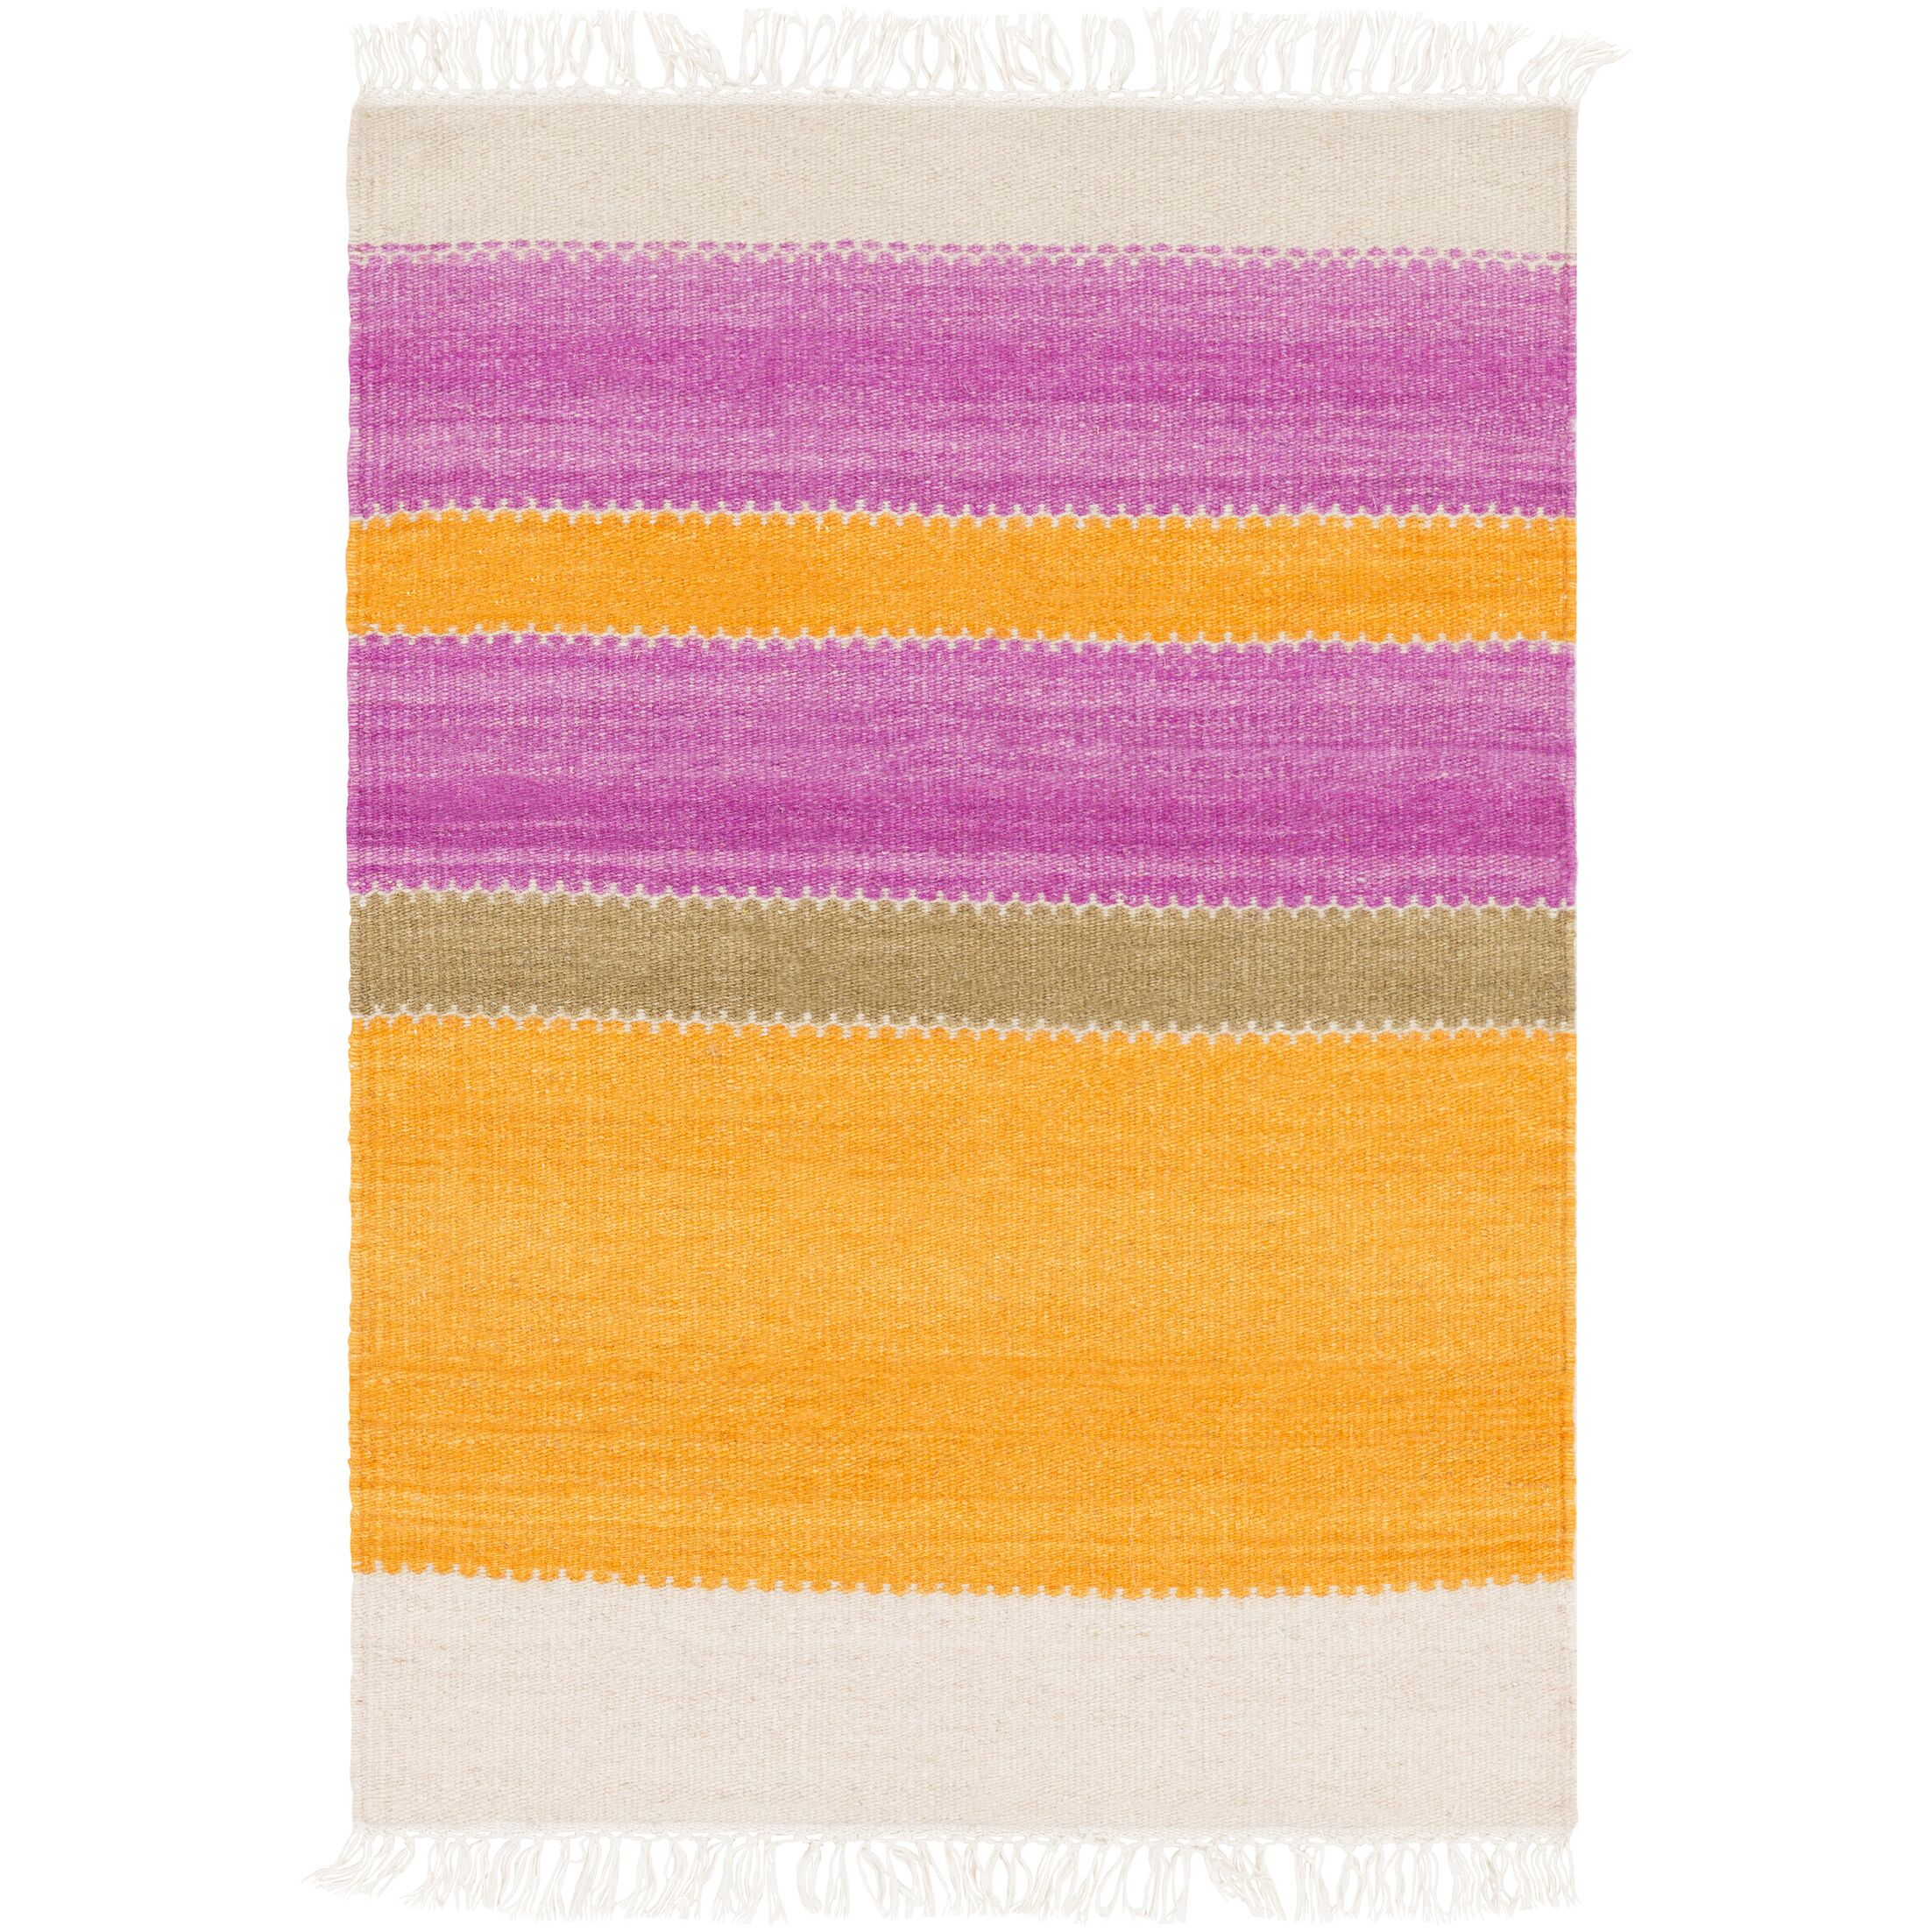 Buckhead Hand-Tufted Tangerine/Magenta Area Rug Rug Size: Rectangle 8' x 10'